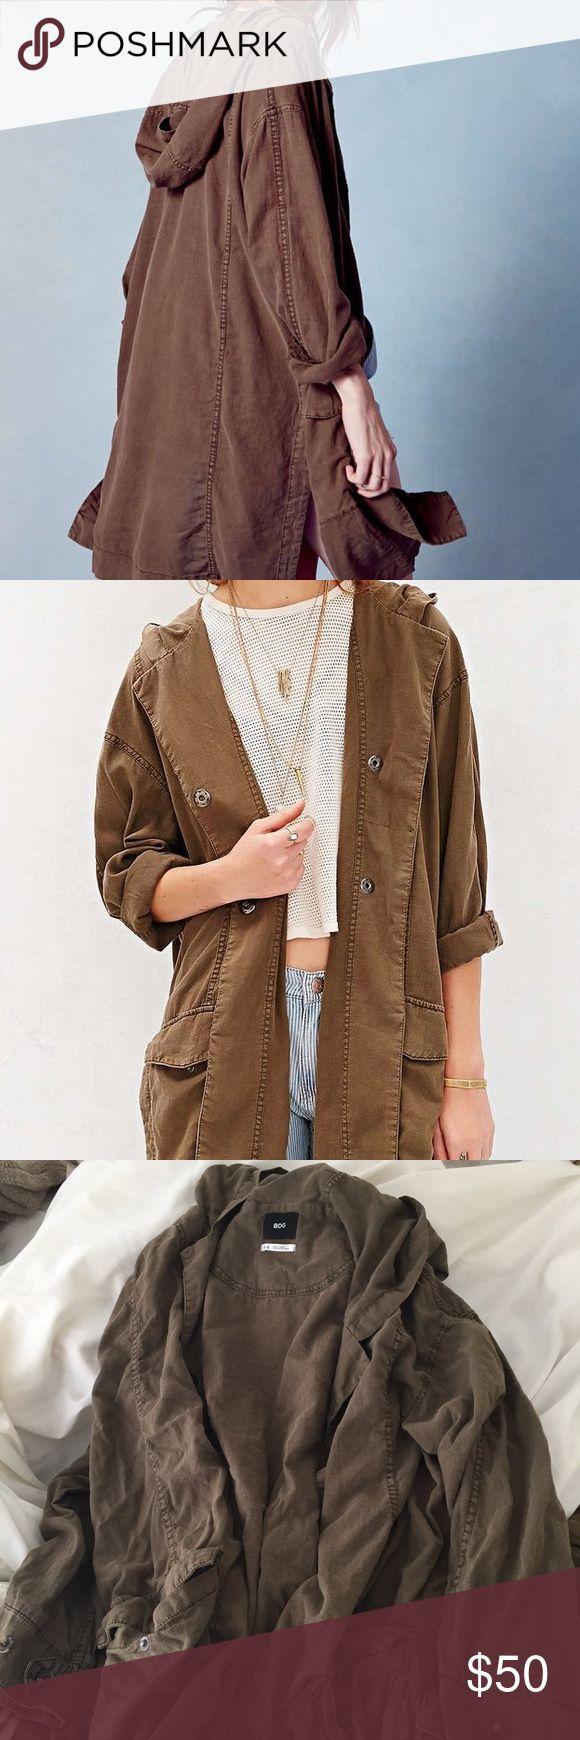 BDG Zanzibar Shop Jacket From Urban Outfitters BDG ( Never Worn ) Urban Outfitters Tops Sweatshirts & Hoodies